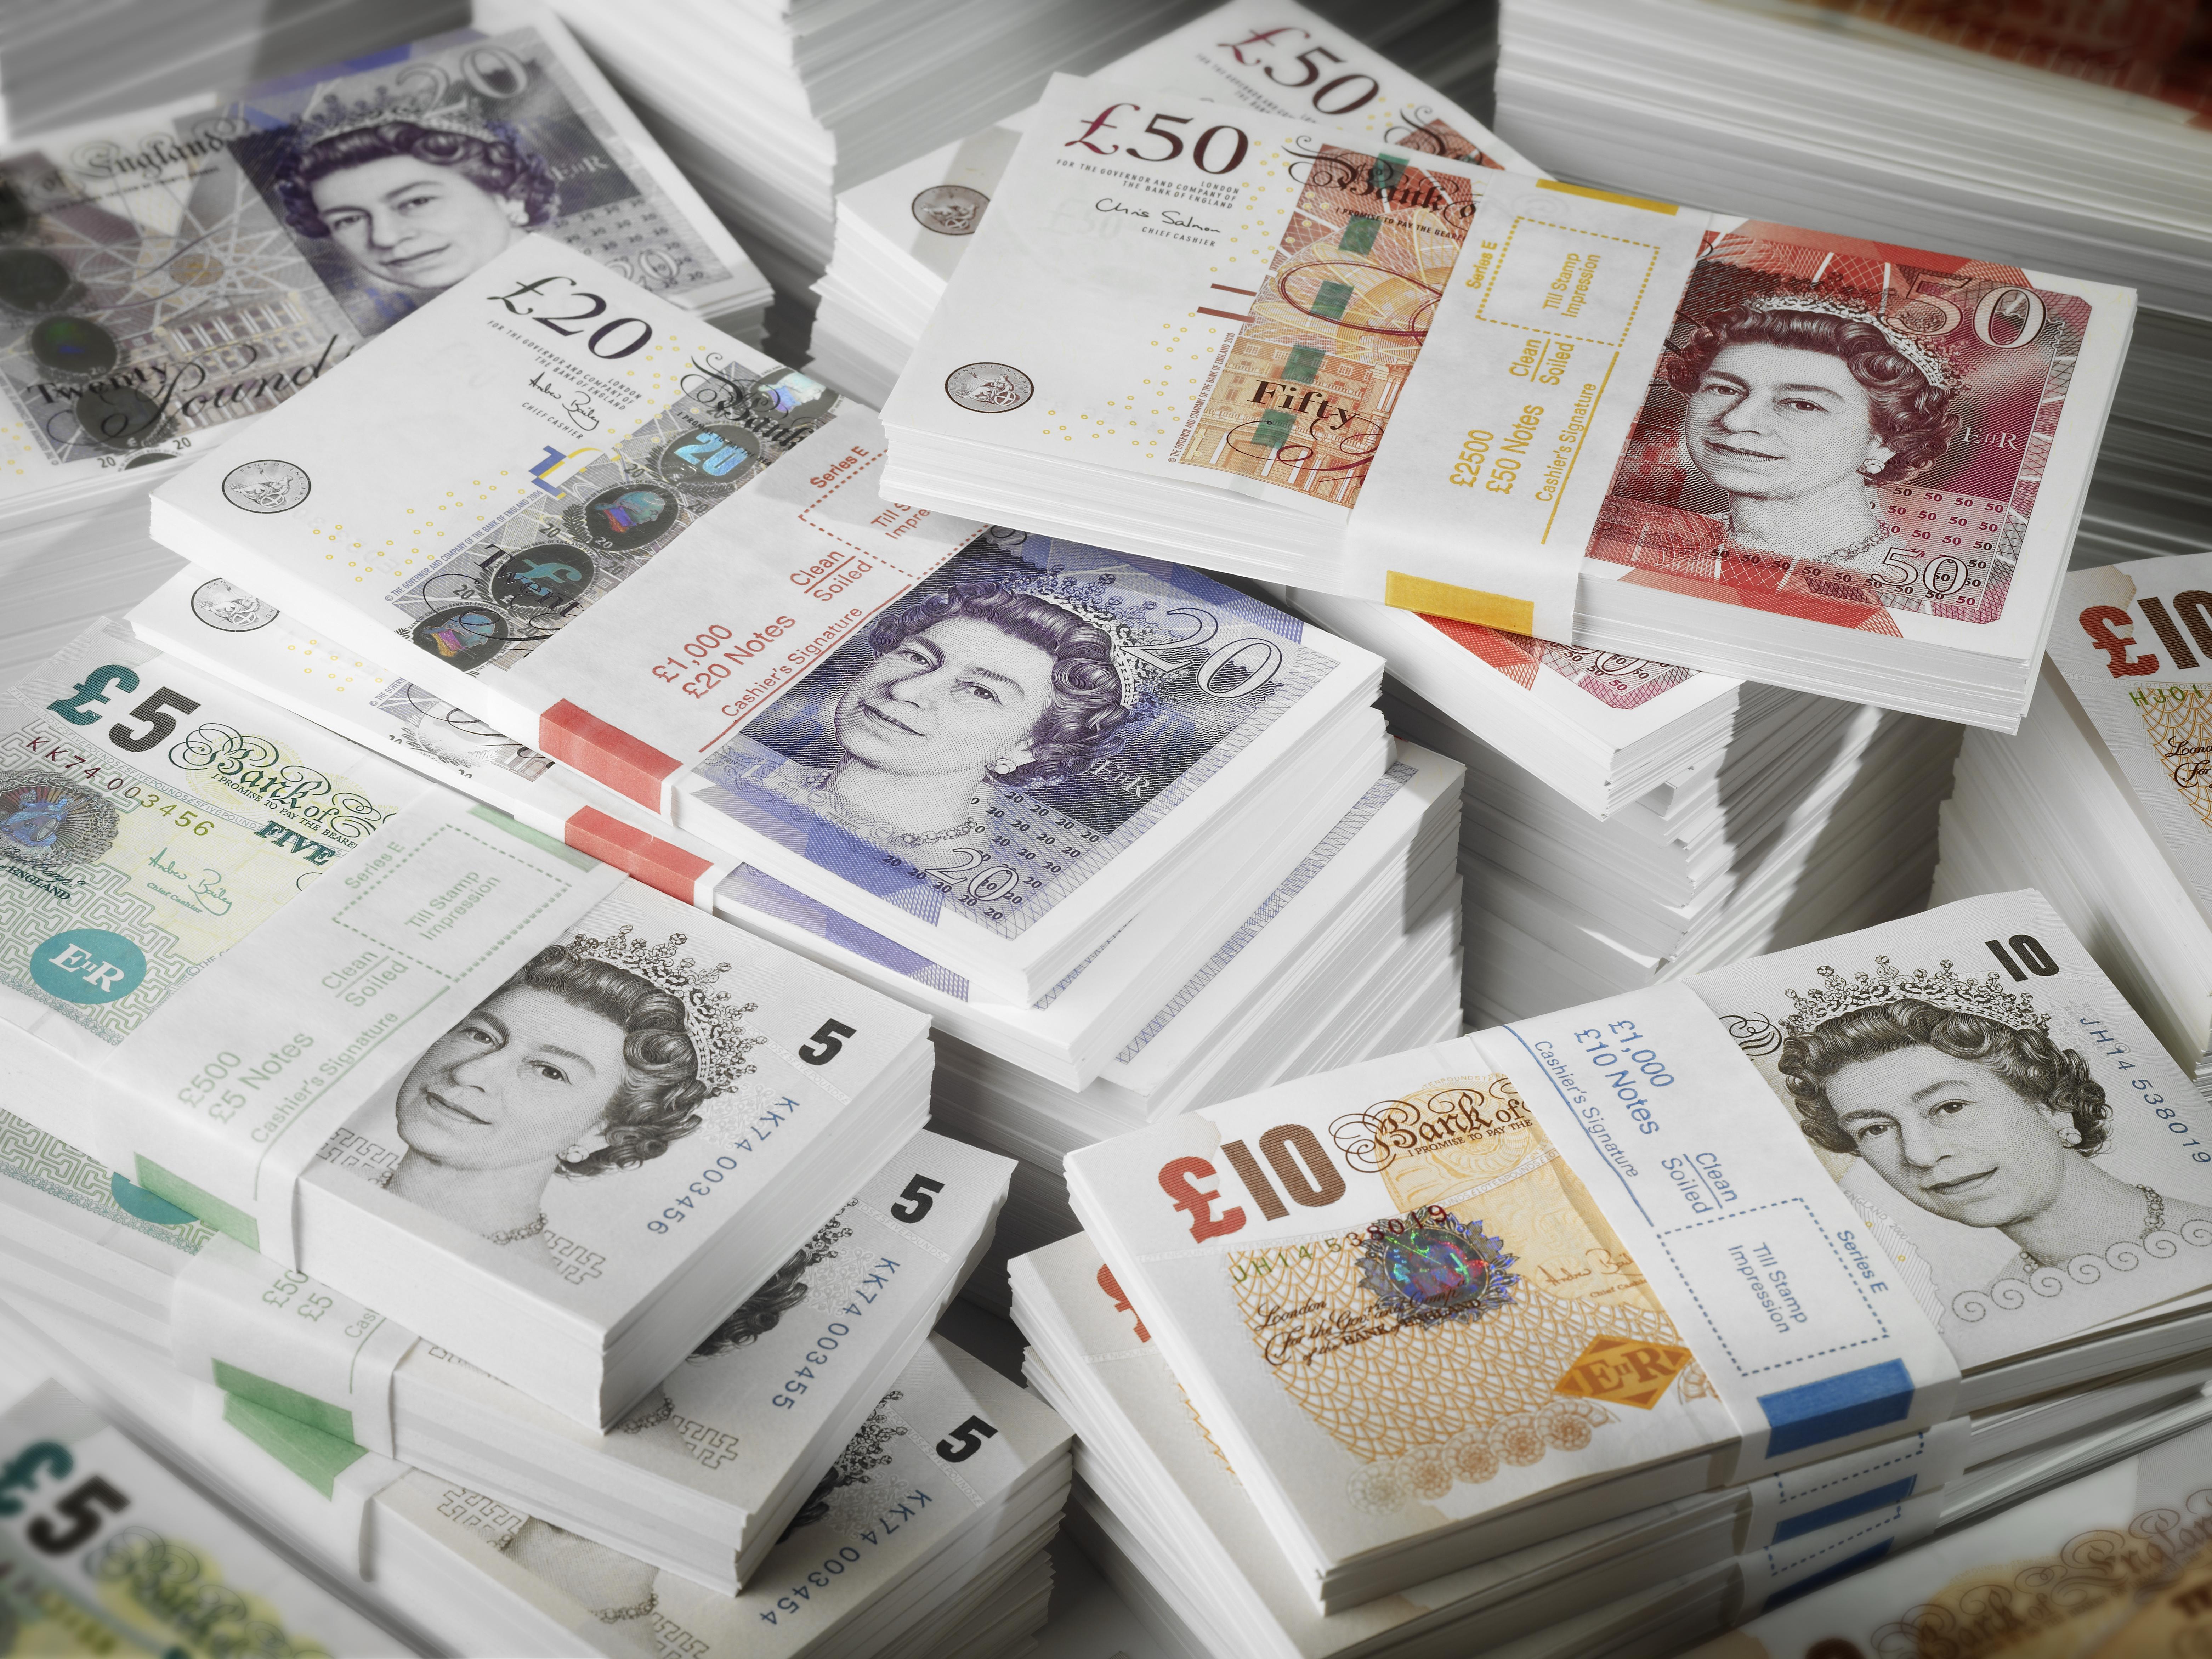 Bundles and Piles of UK Banknotes